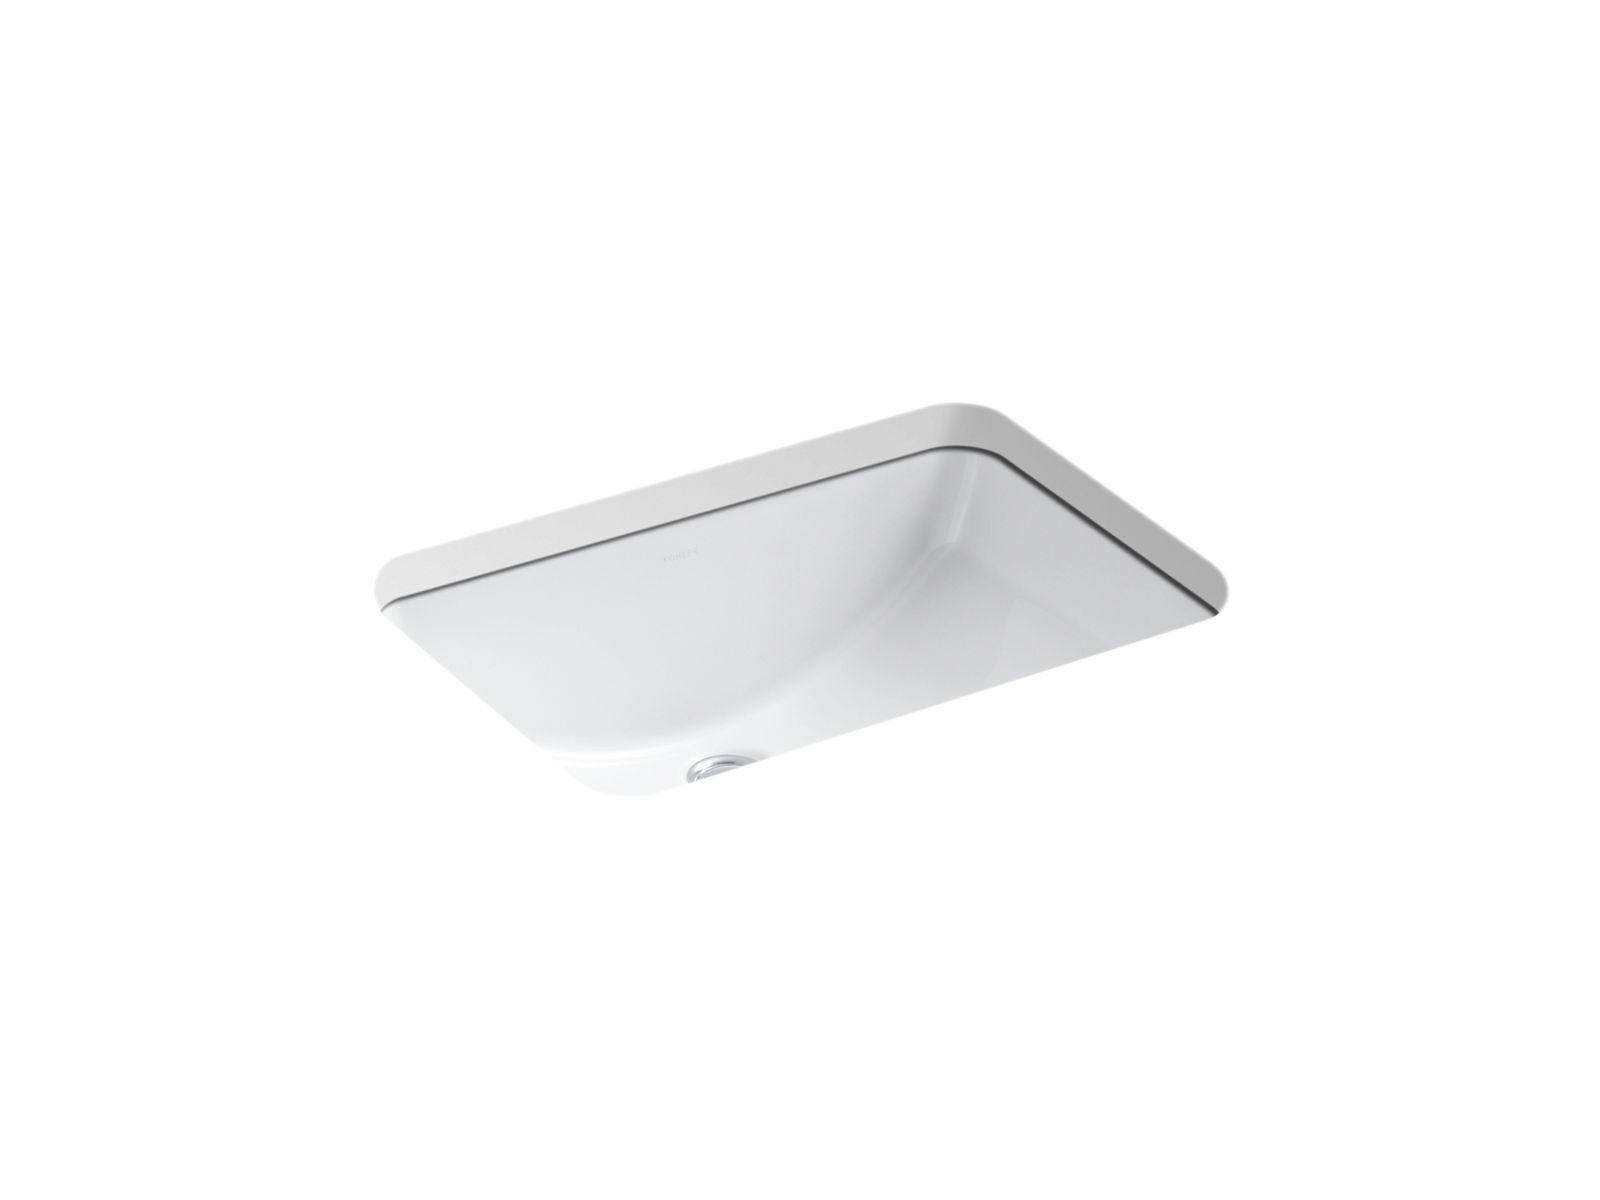 K 2214 | Ladena Undermount Sink | KOHLER